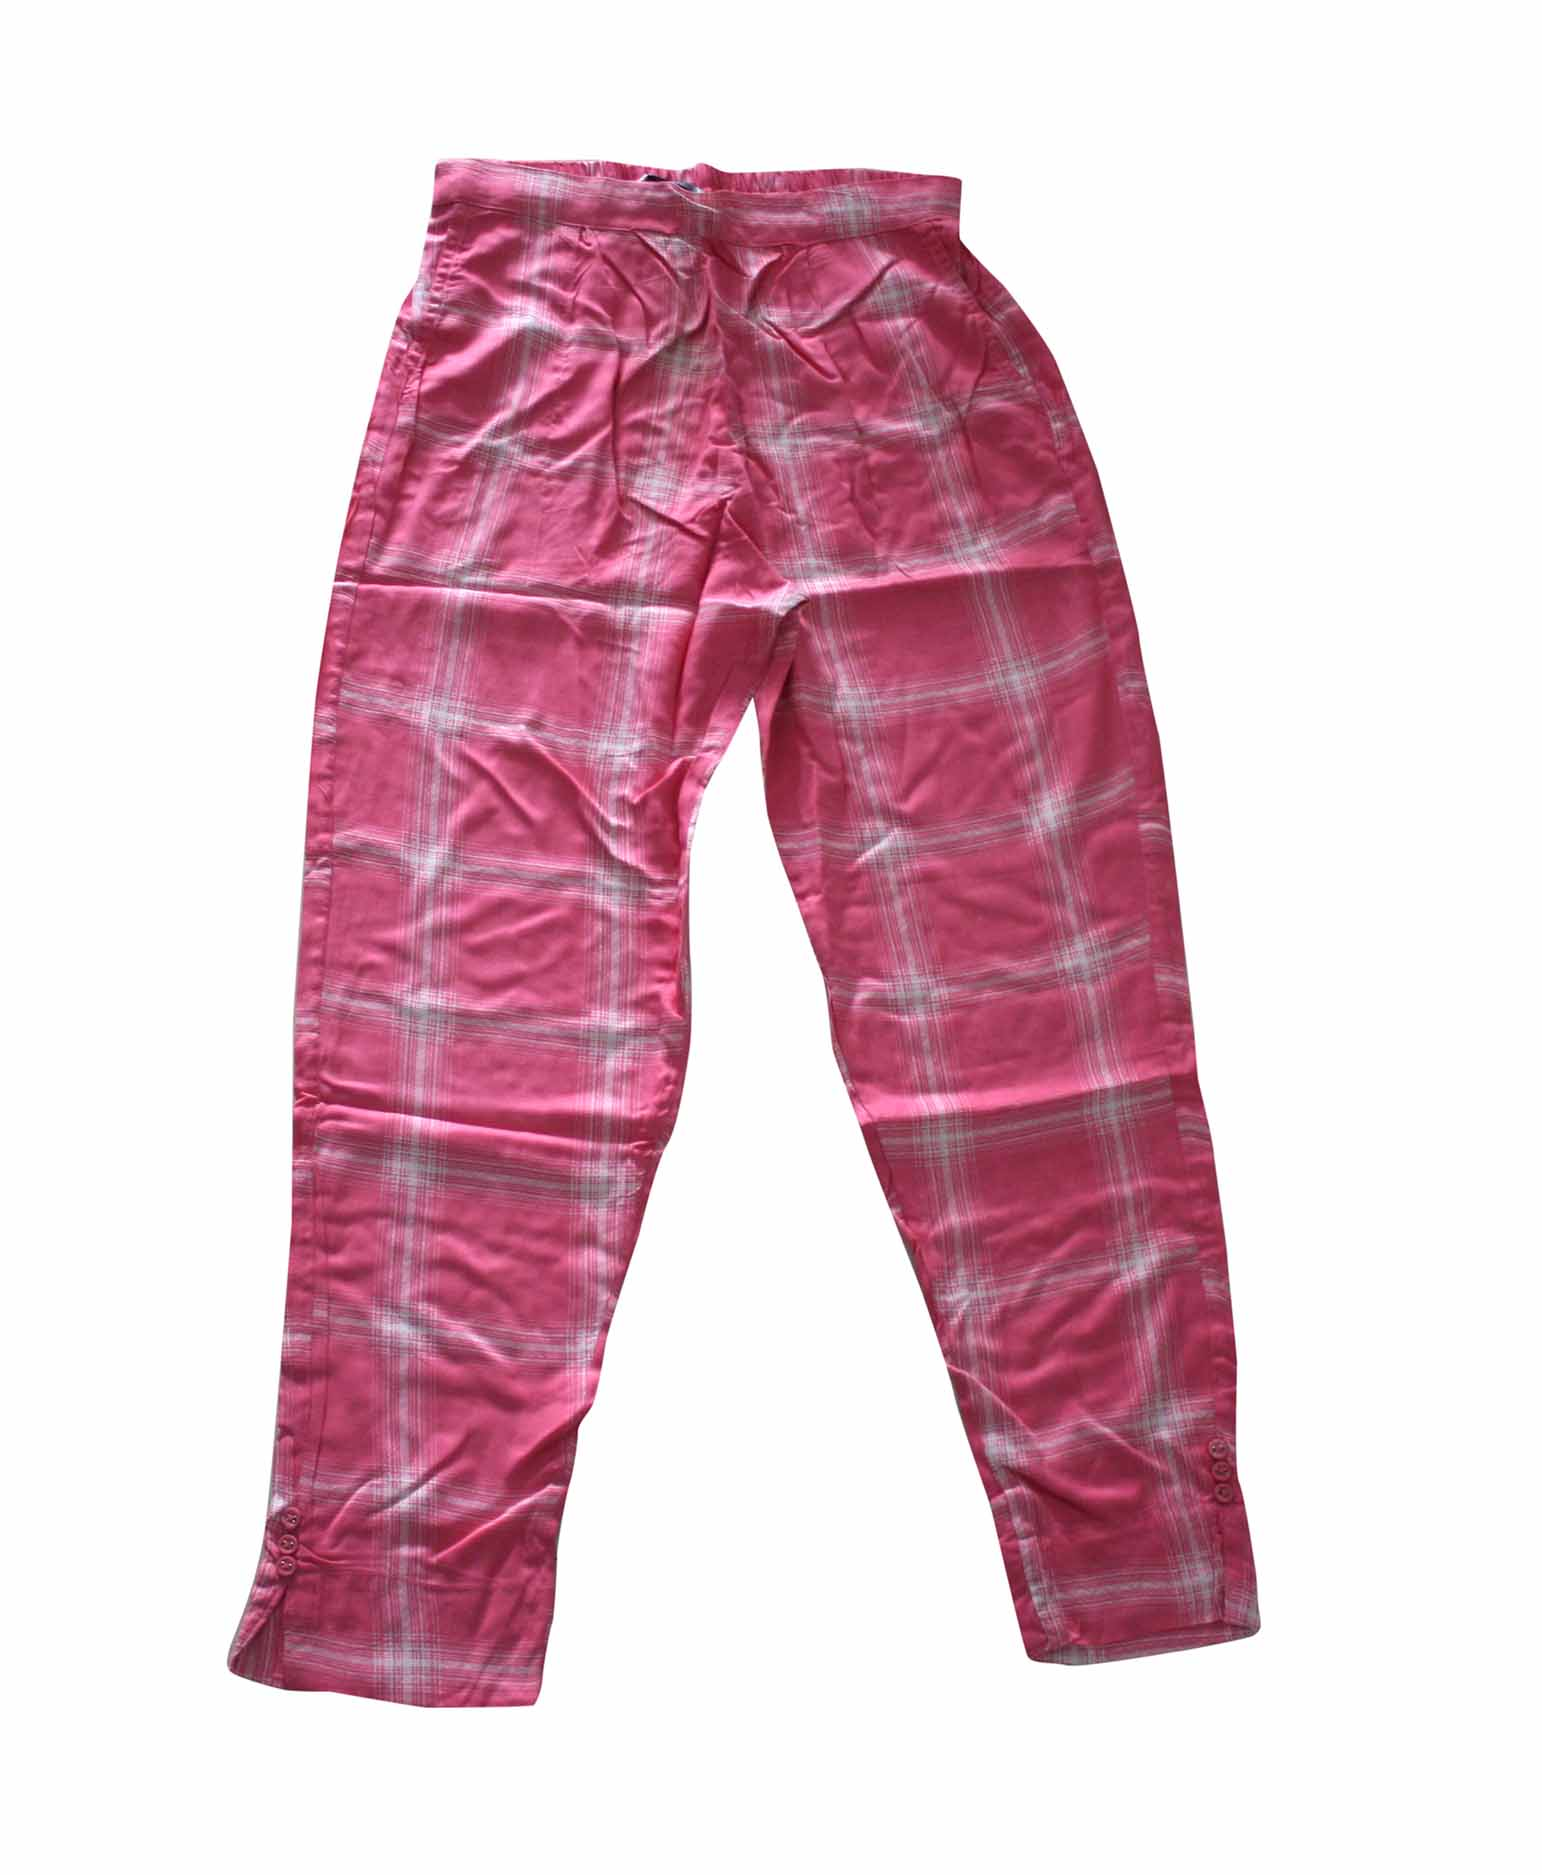 SOMAYA D NO 5-PINK WMN PANT